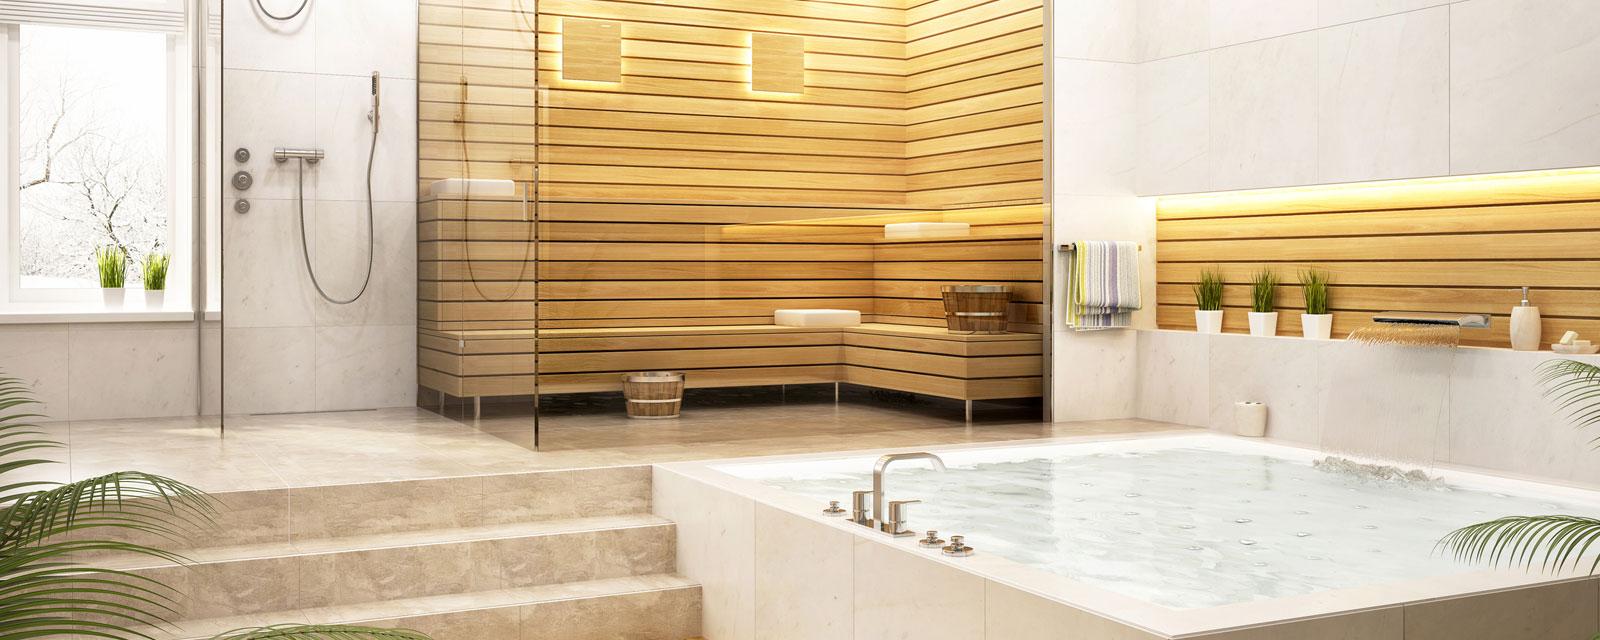 A luxurious bathtub